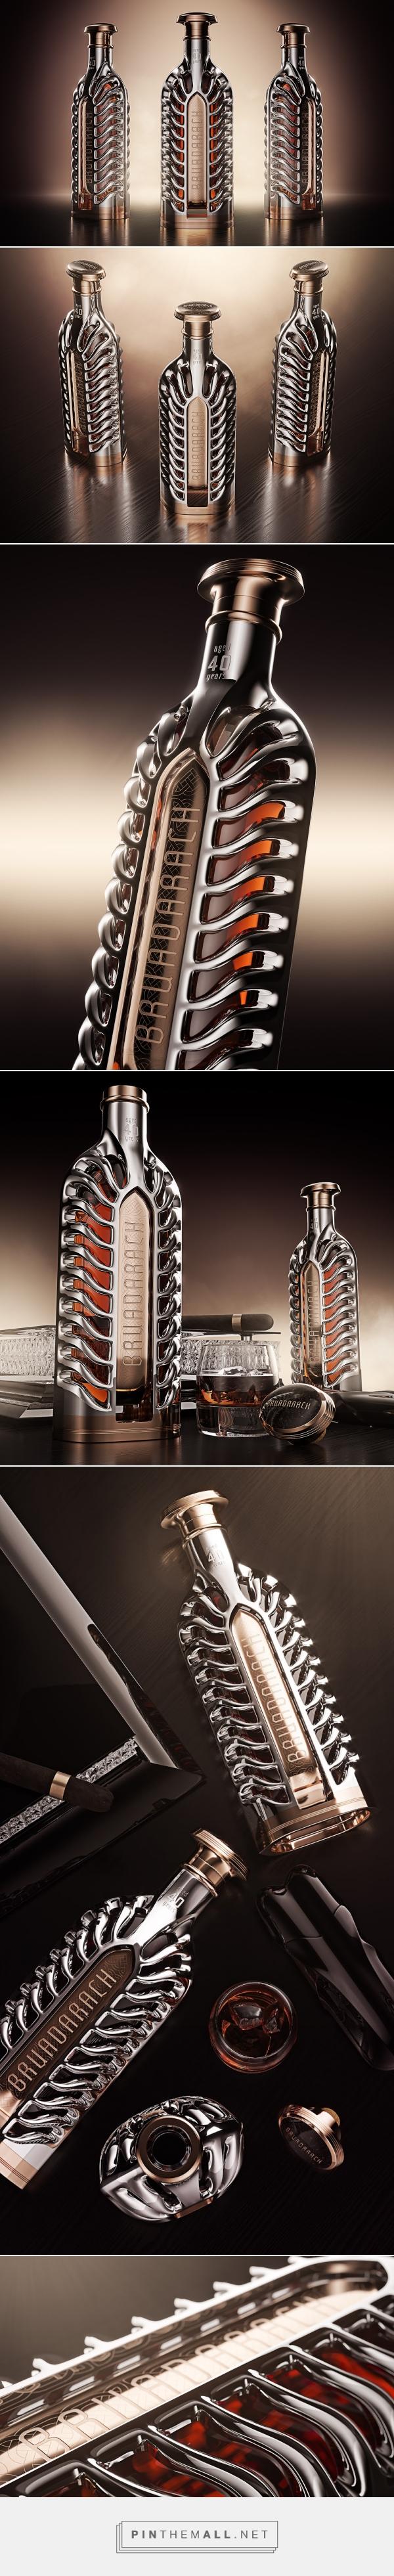 Bruadarach whisky packaging design concept by Ivan Venkov - http://www.packagingoftheworld.com/2017/04/bruadarach-concept.html